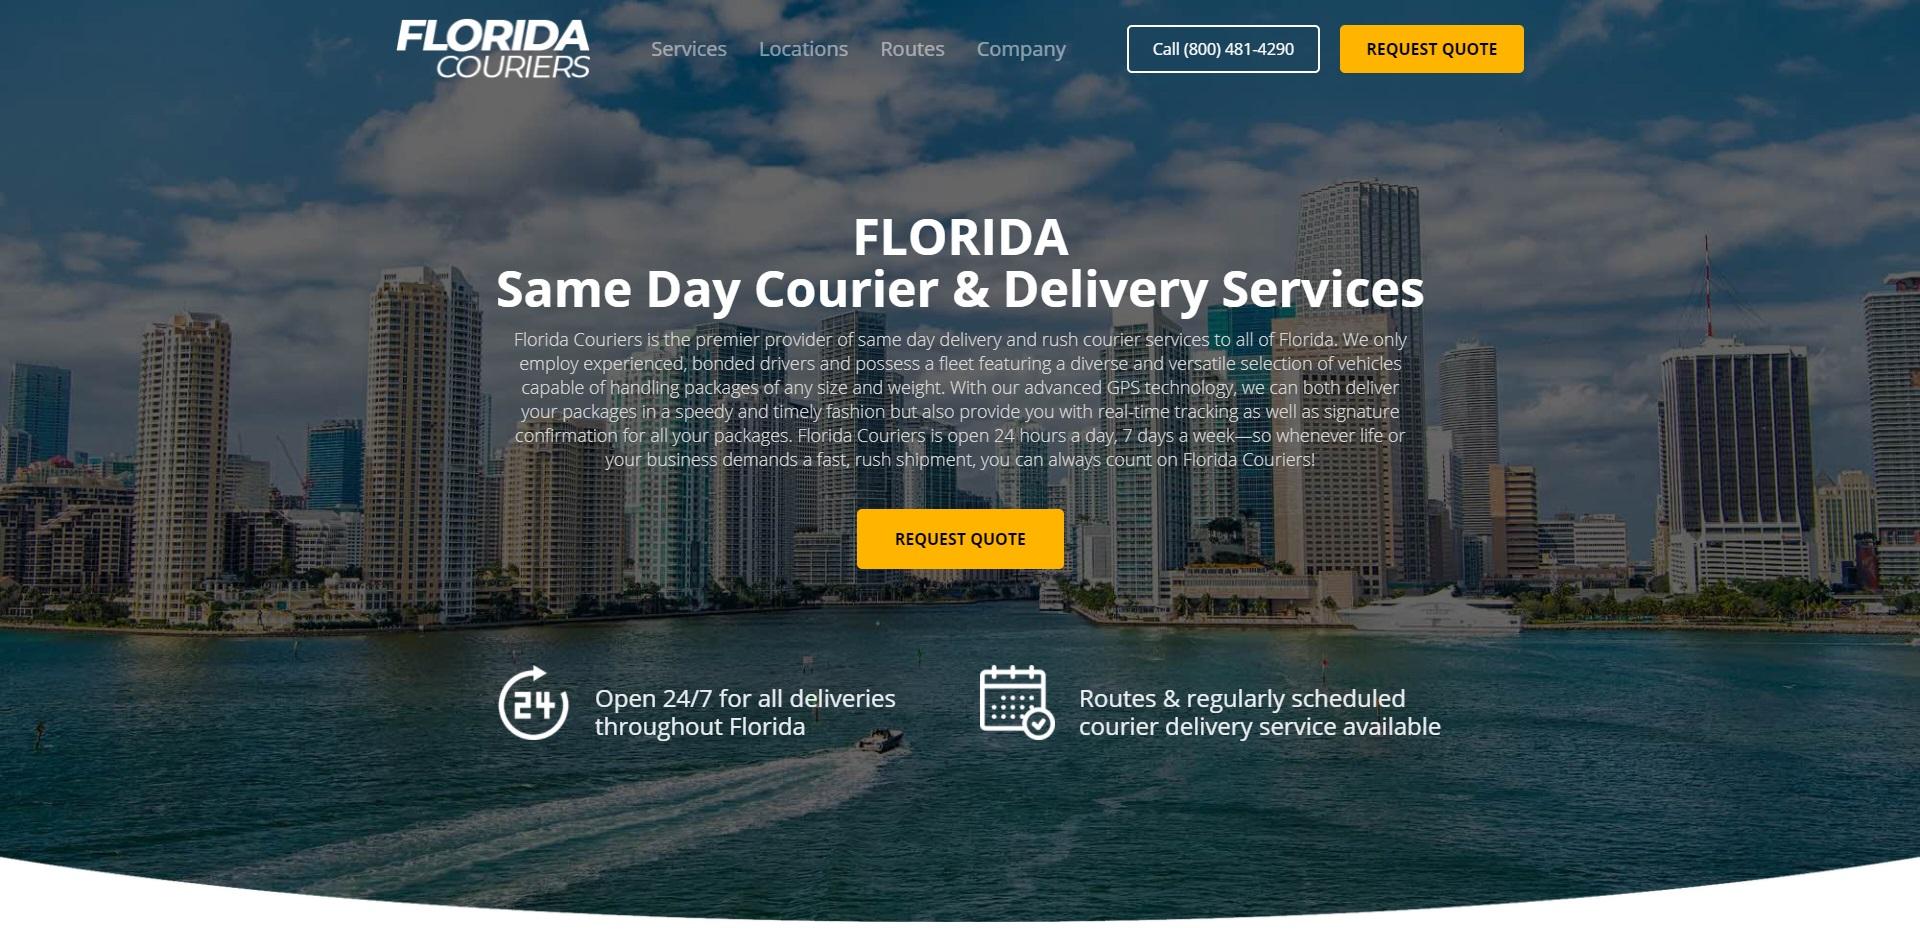 Jacksonville's Best Courier Services